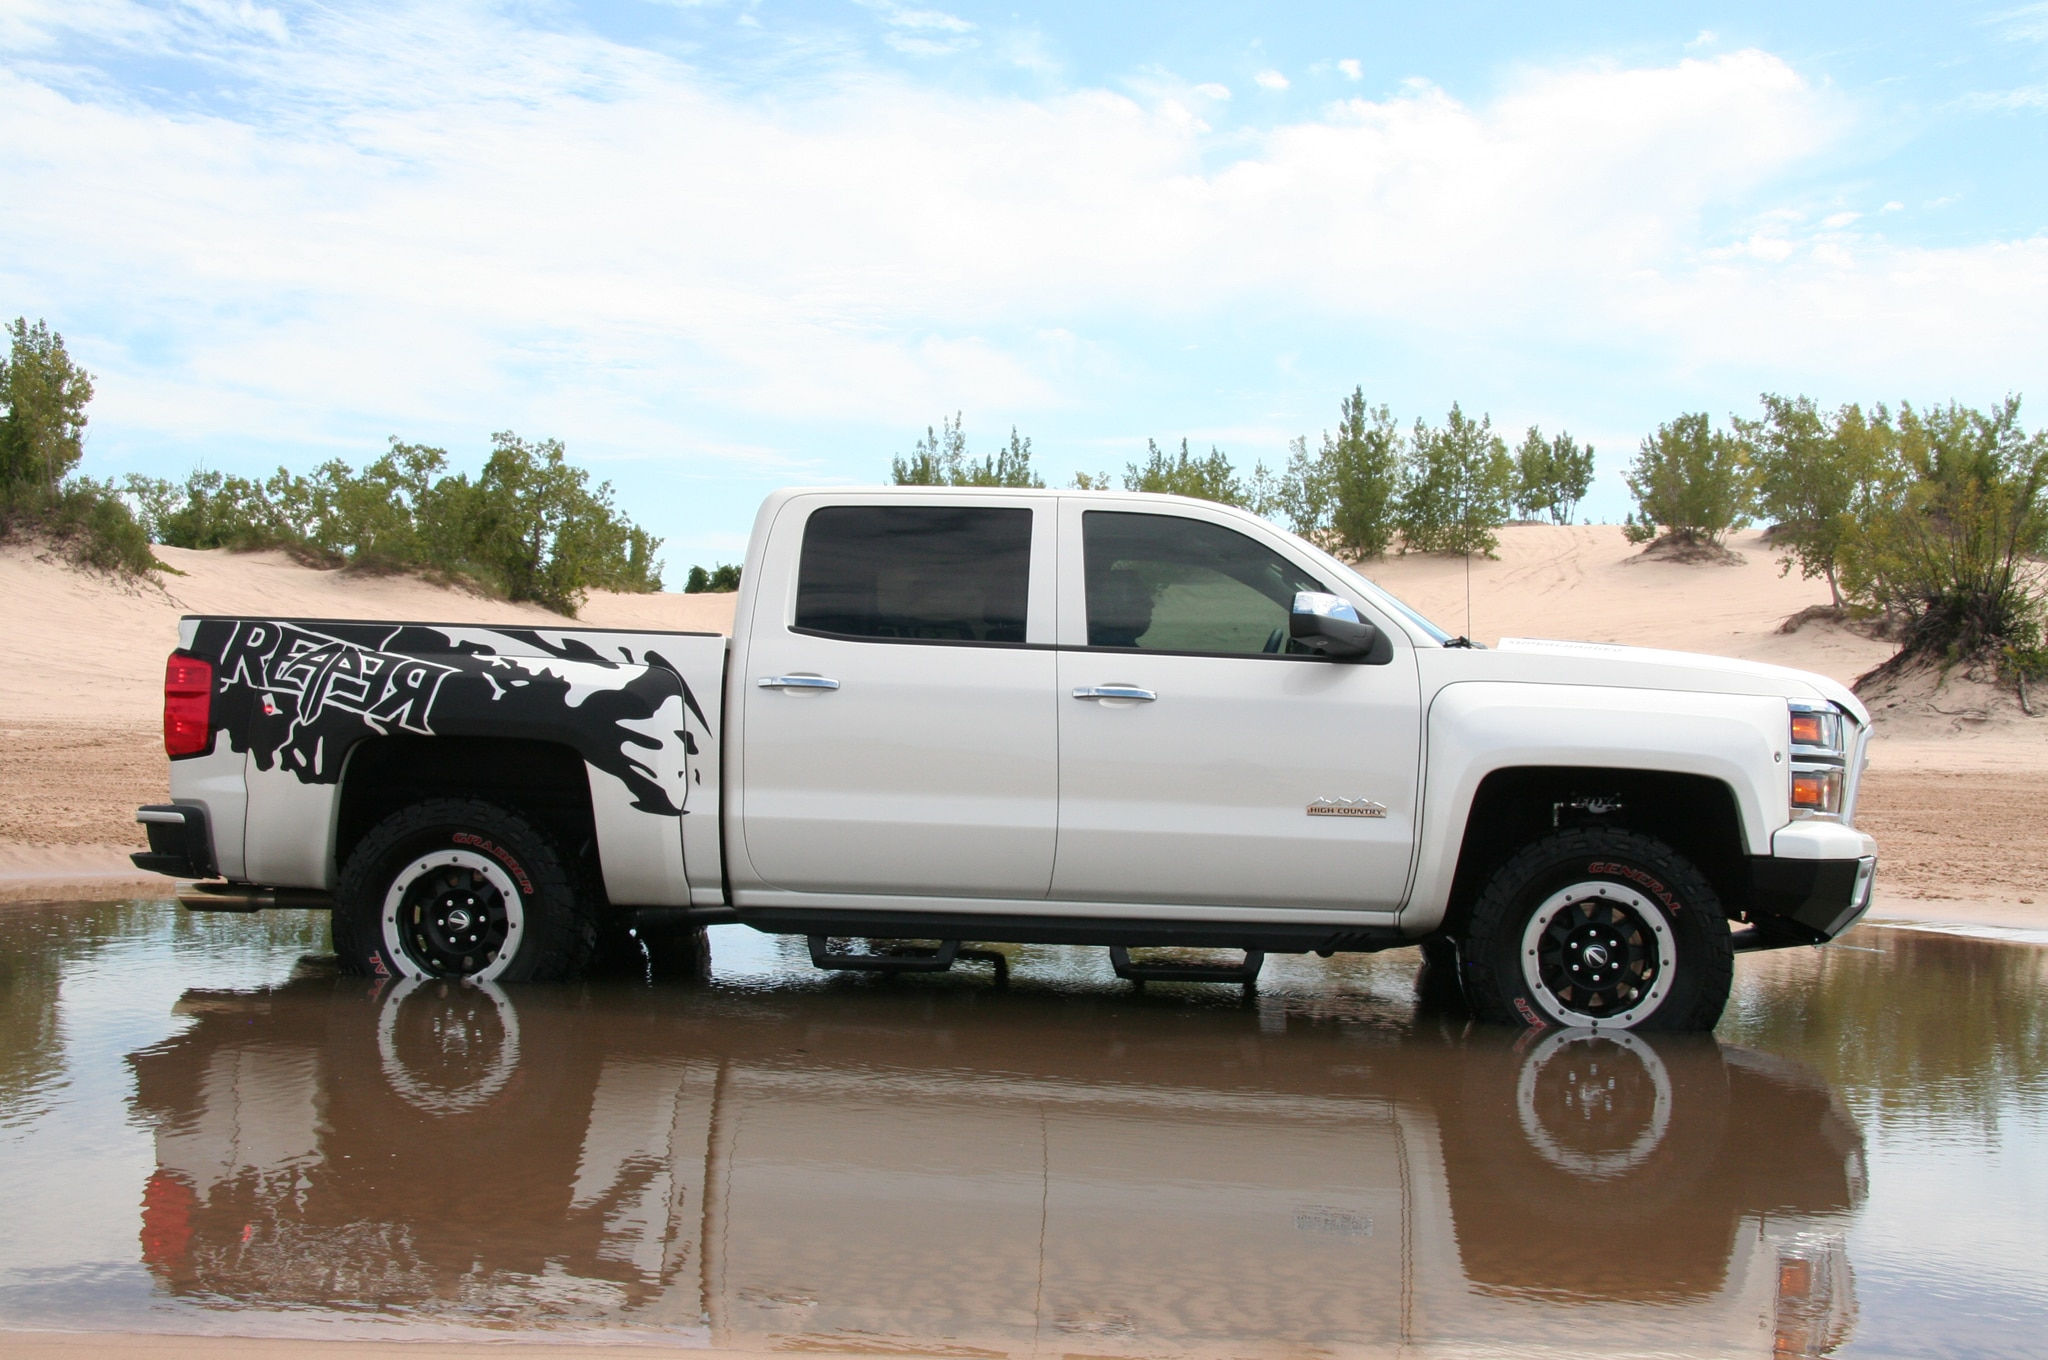 Chevy Reaper For Sale >> 2014 Chevrolet Silverado Reaper First Drive